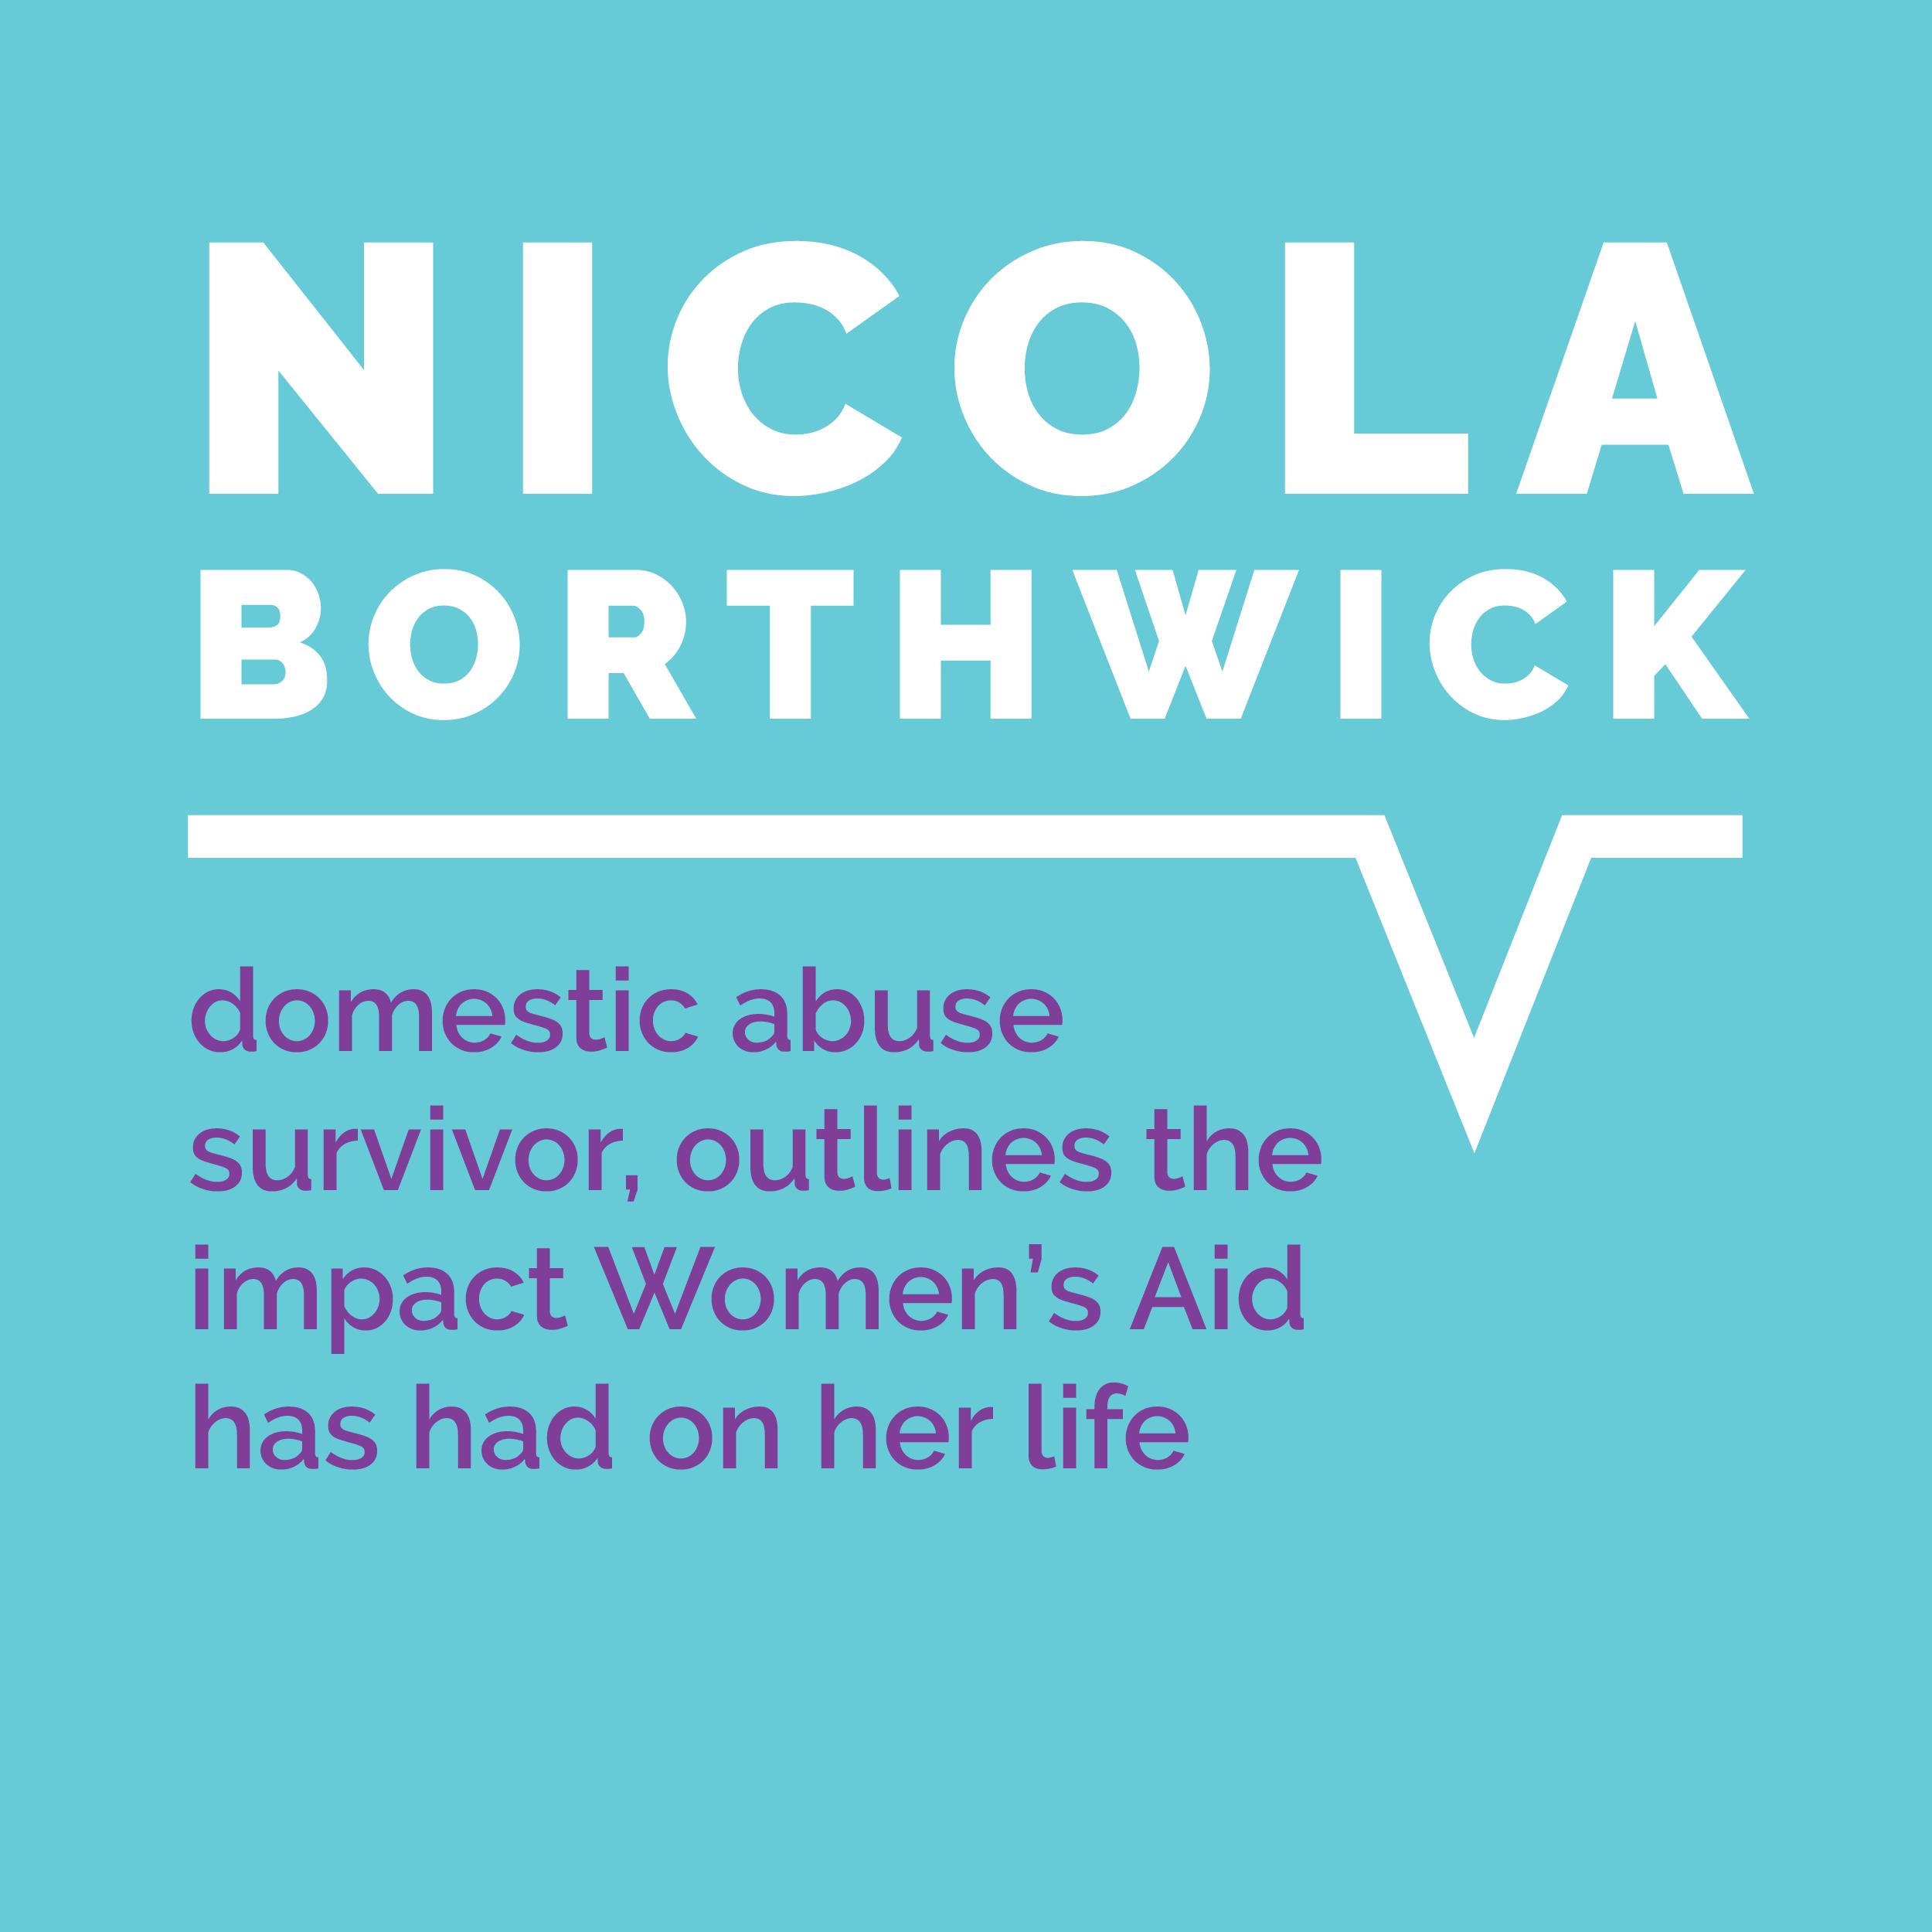 Nicola Borthwick, domestic abuse survivor, outlines the impact Women's Aid has had on her life